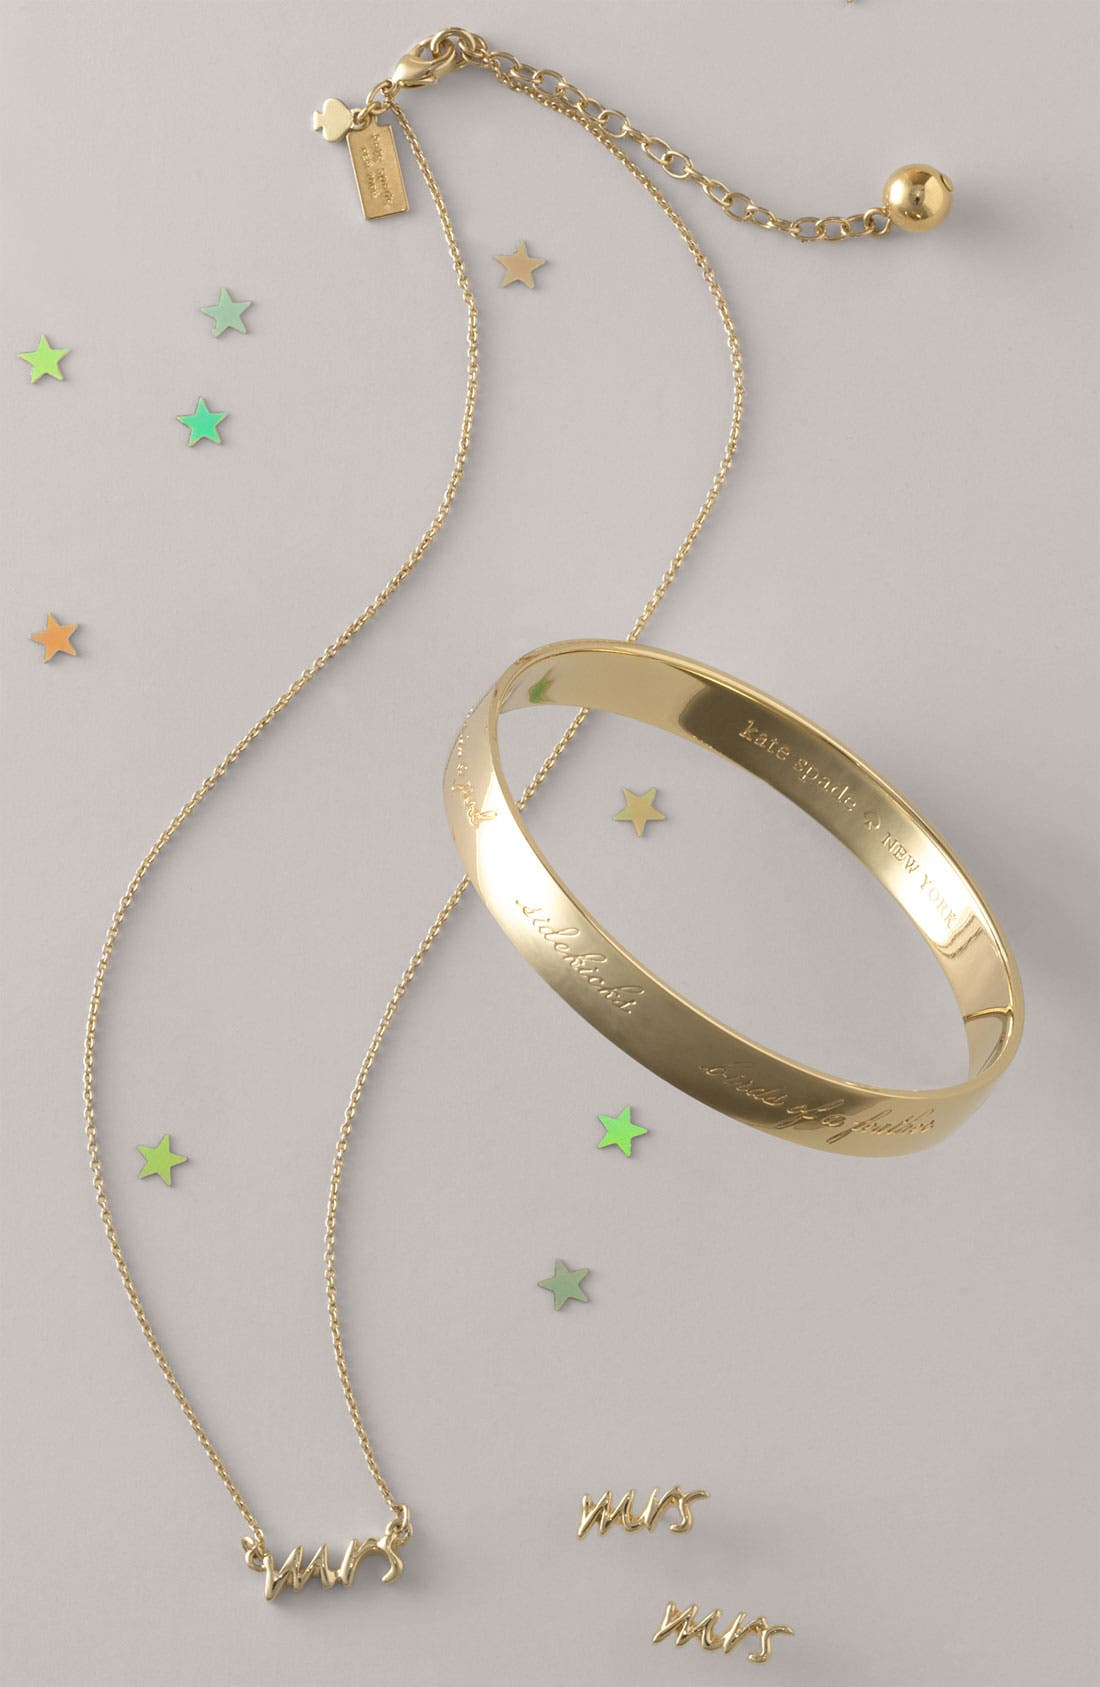 'idiom - bridesmaid' bangle,                             Alternate thumbnail 2, color,                             ROSE GOLD